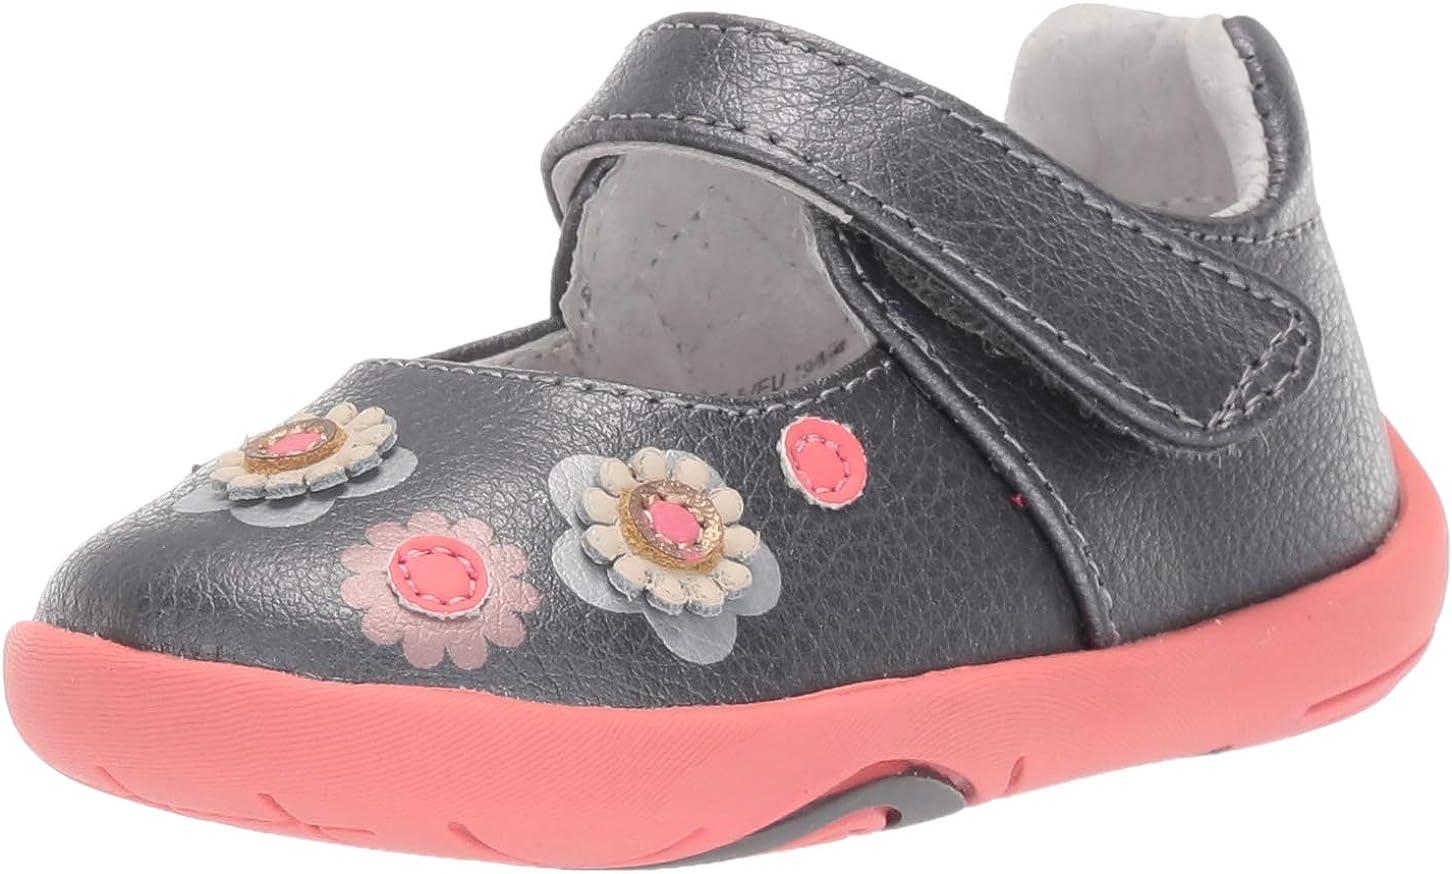 pediped Unisex-Child Flora First Walker Shoe